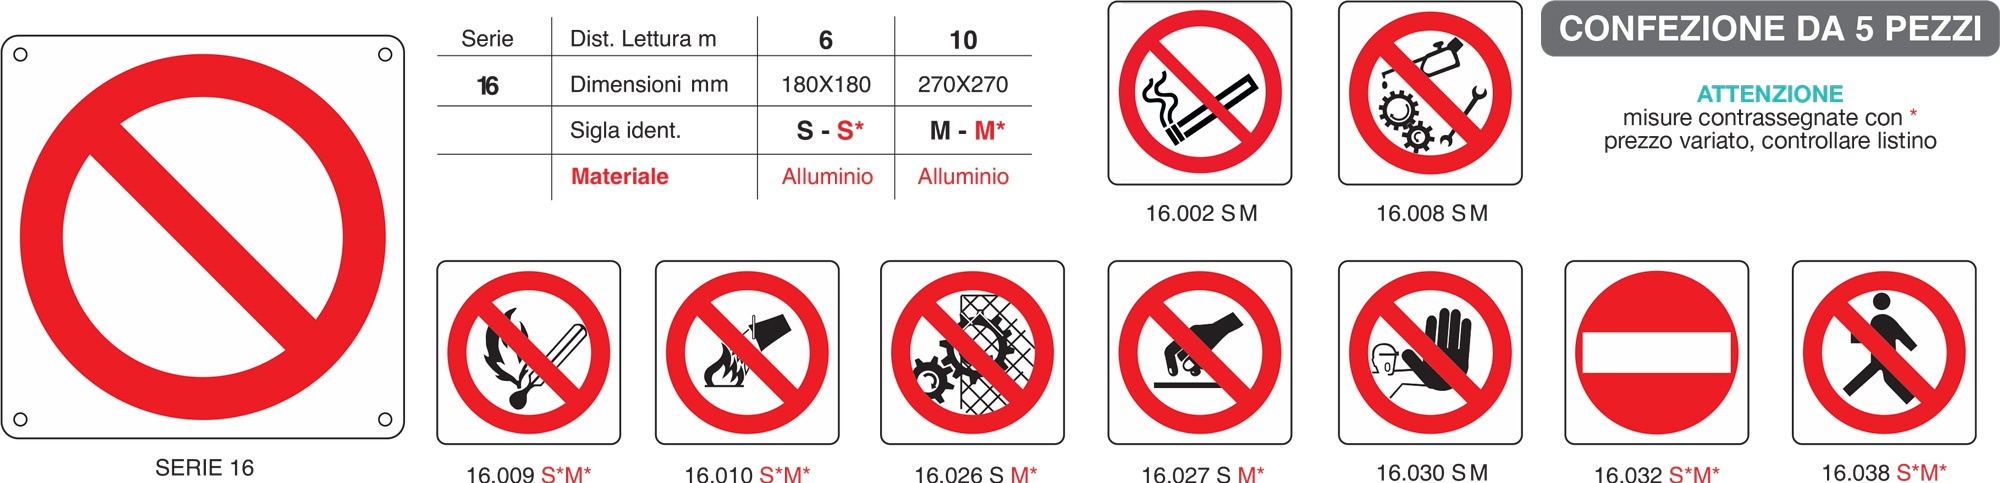 Cartelli di divieto: simboli